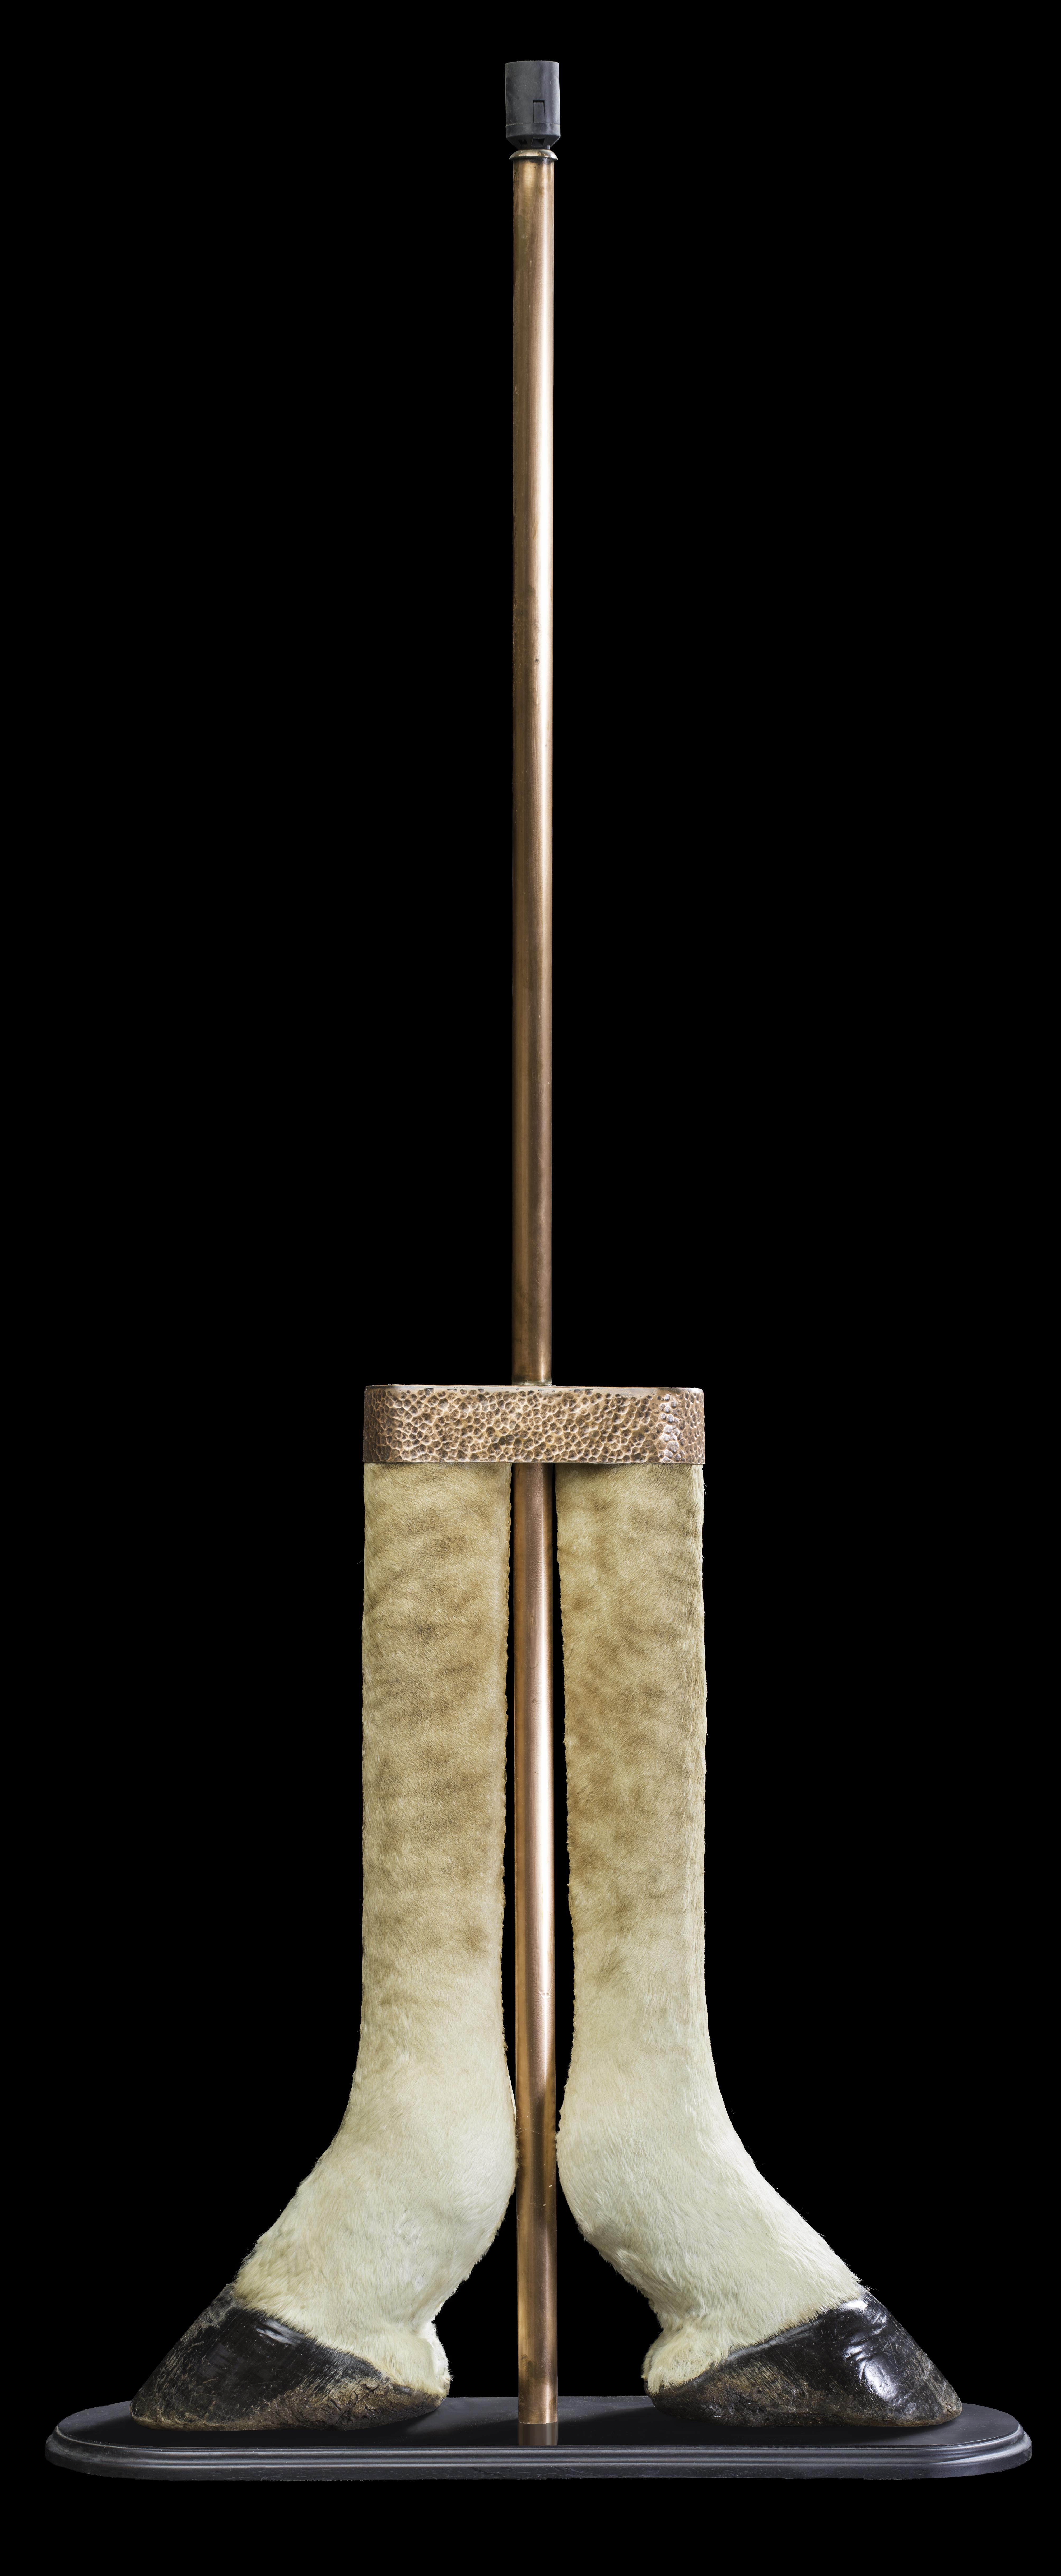 giraffe-double-foot-lamp-ff-018-jpg.424568